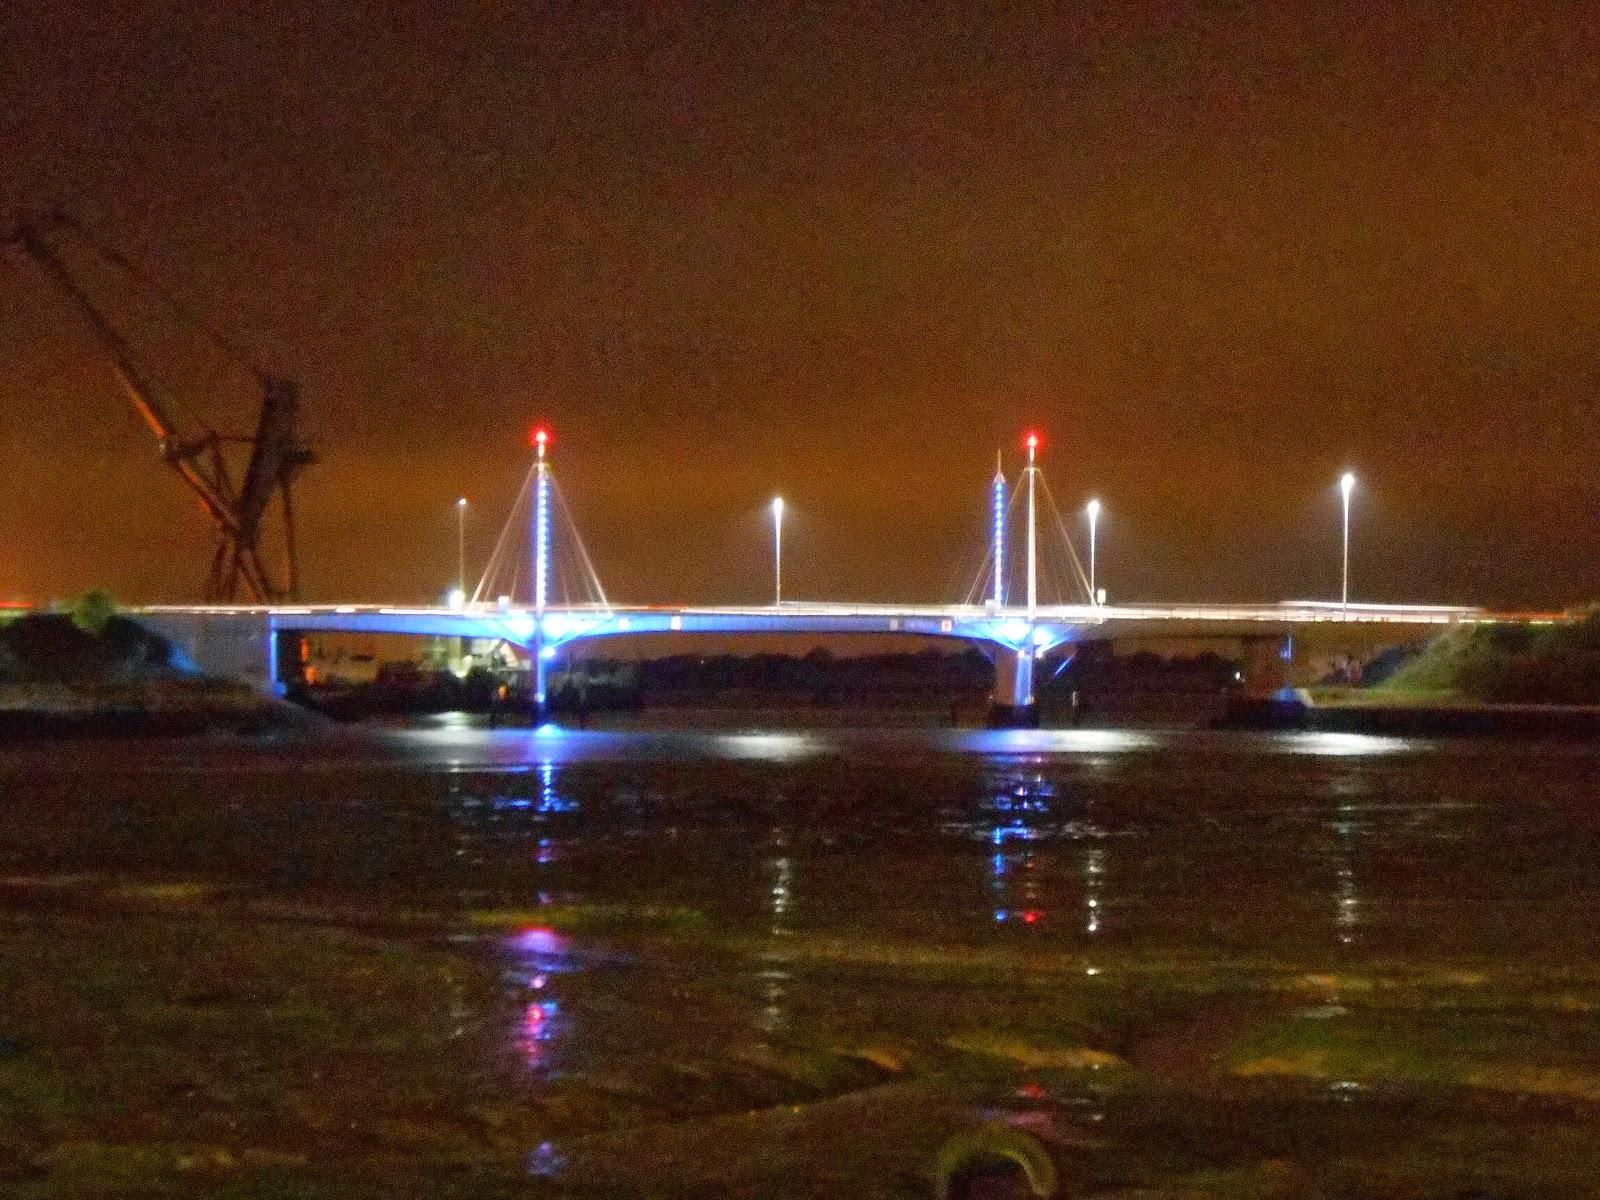 sky glow over portsmouth tipner lake and motorway bridge